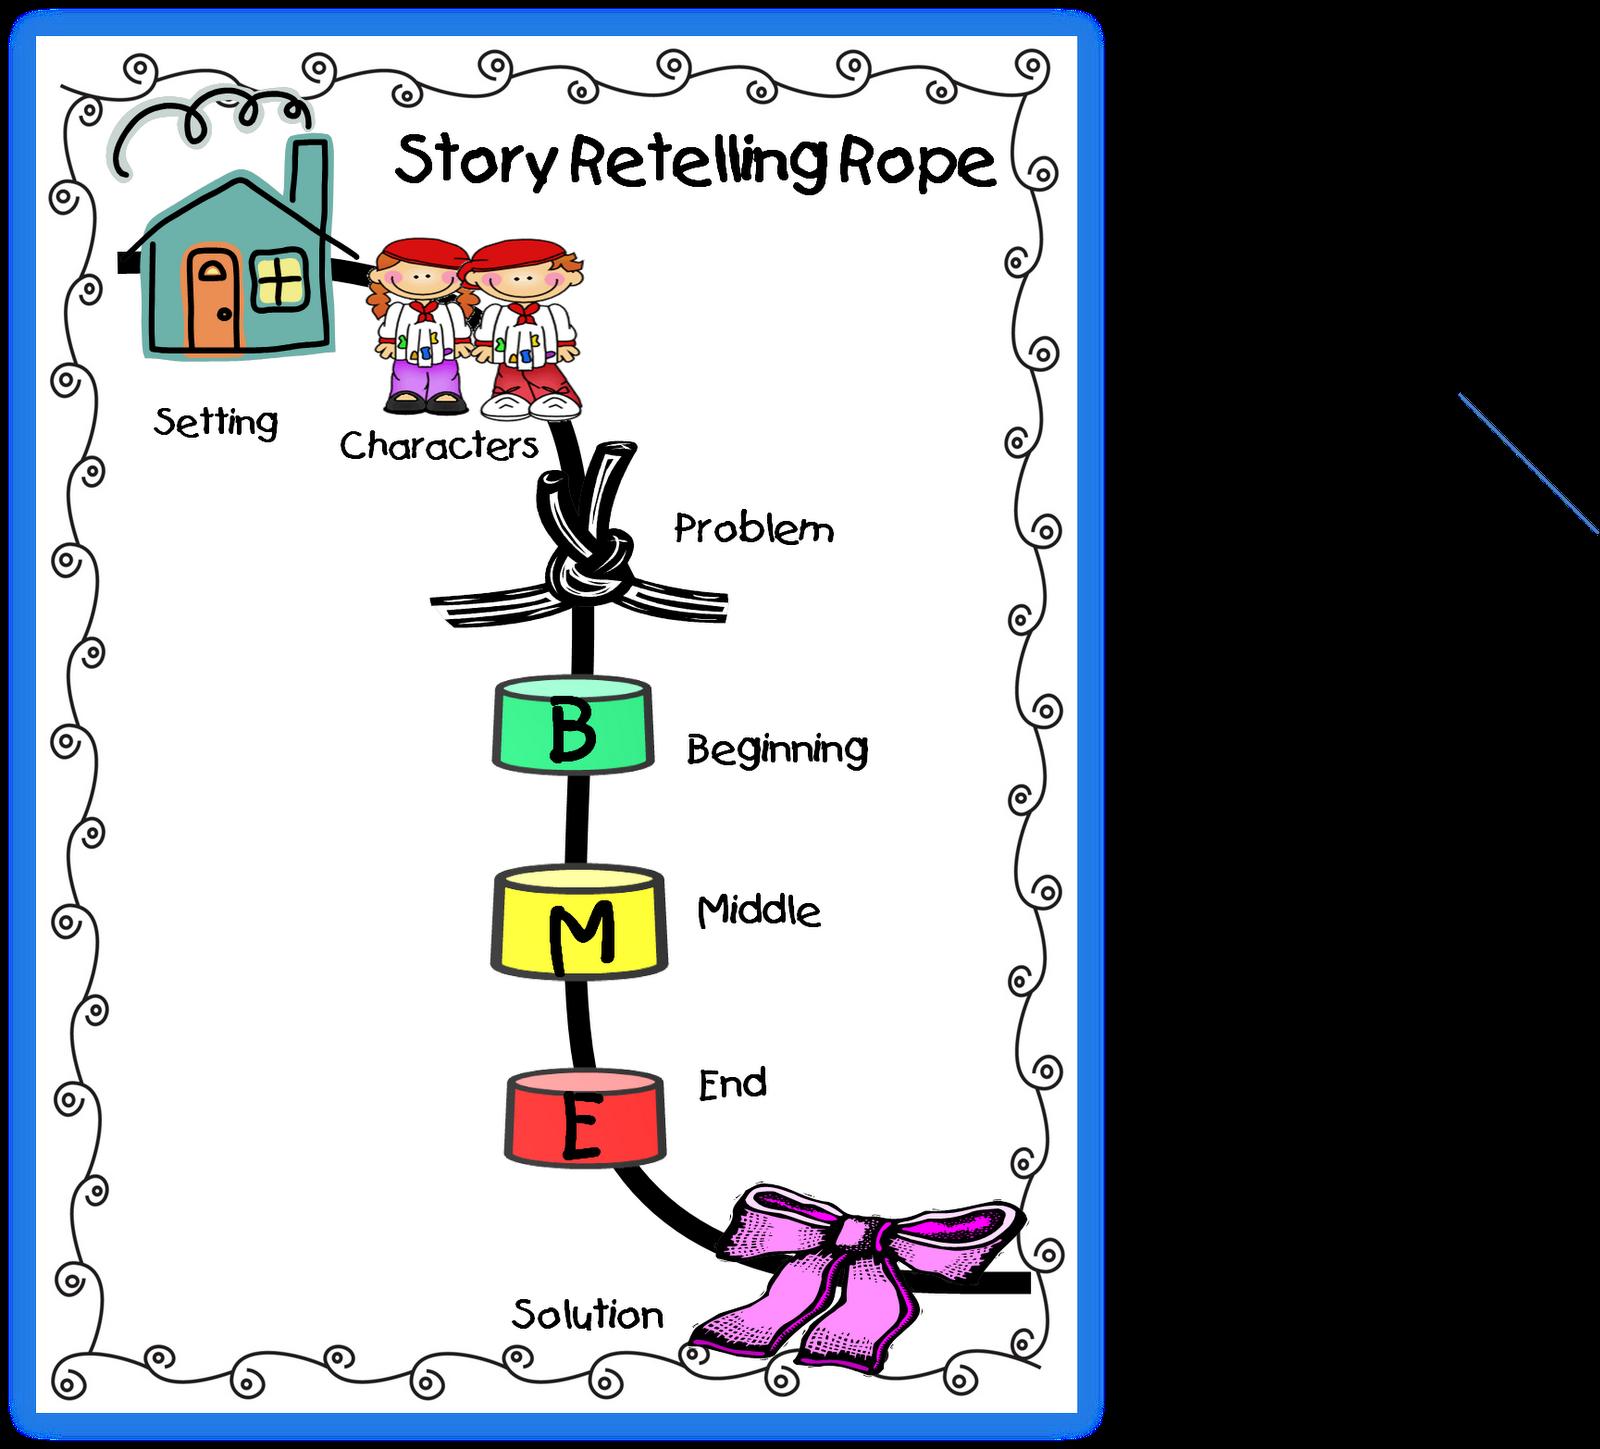 22 Retelling rope ideas   retelling rope [ 1449 x 1600 Pixel ]